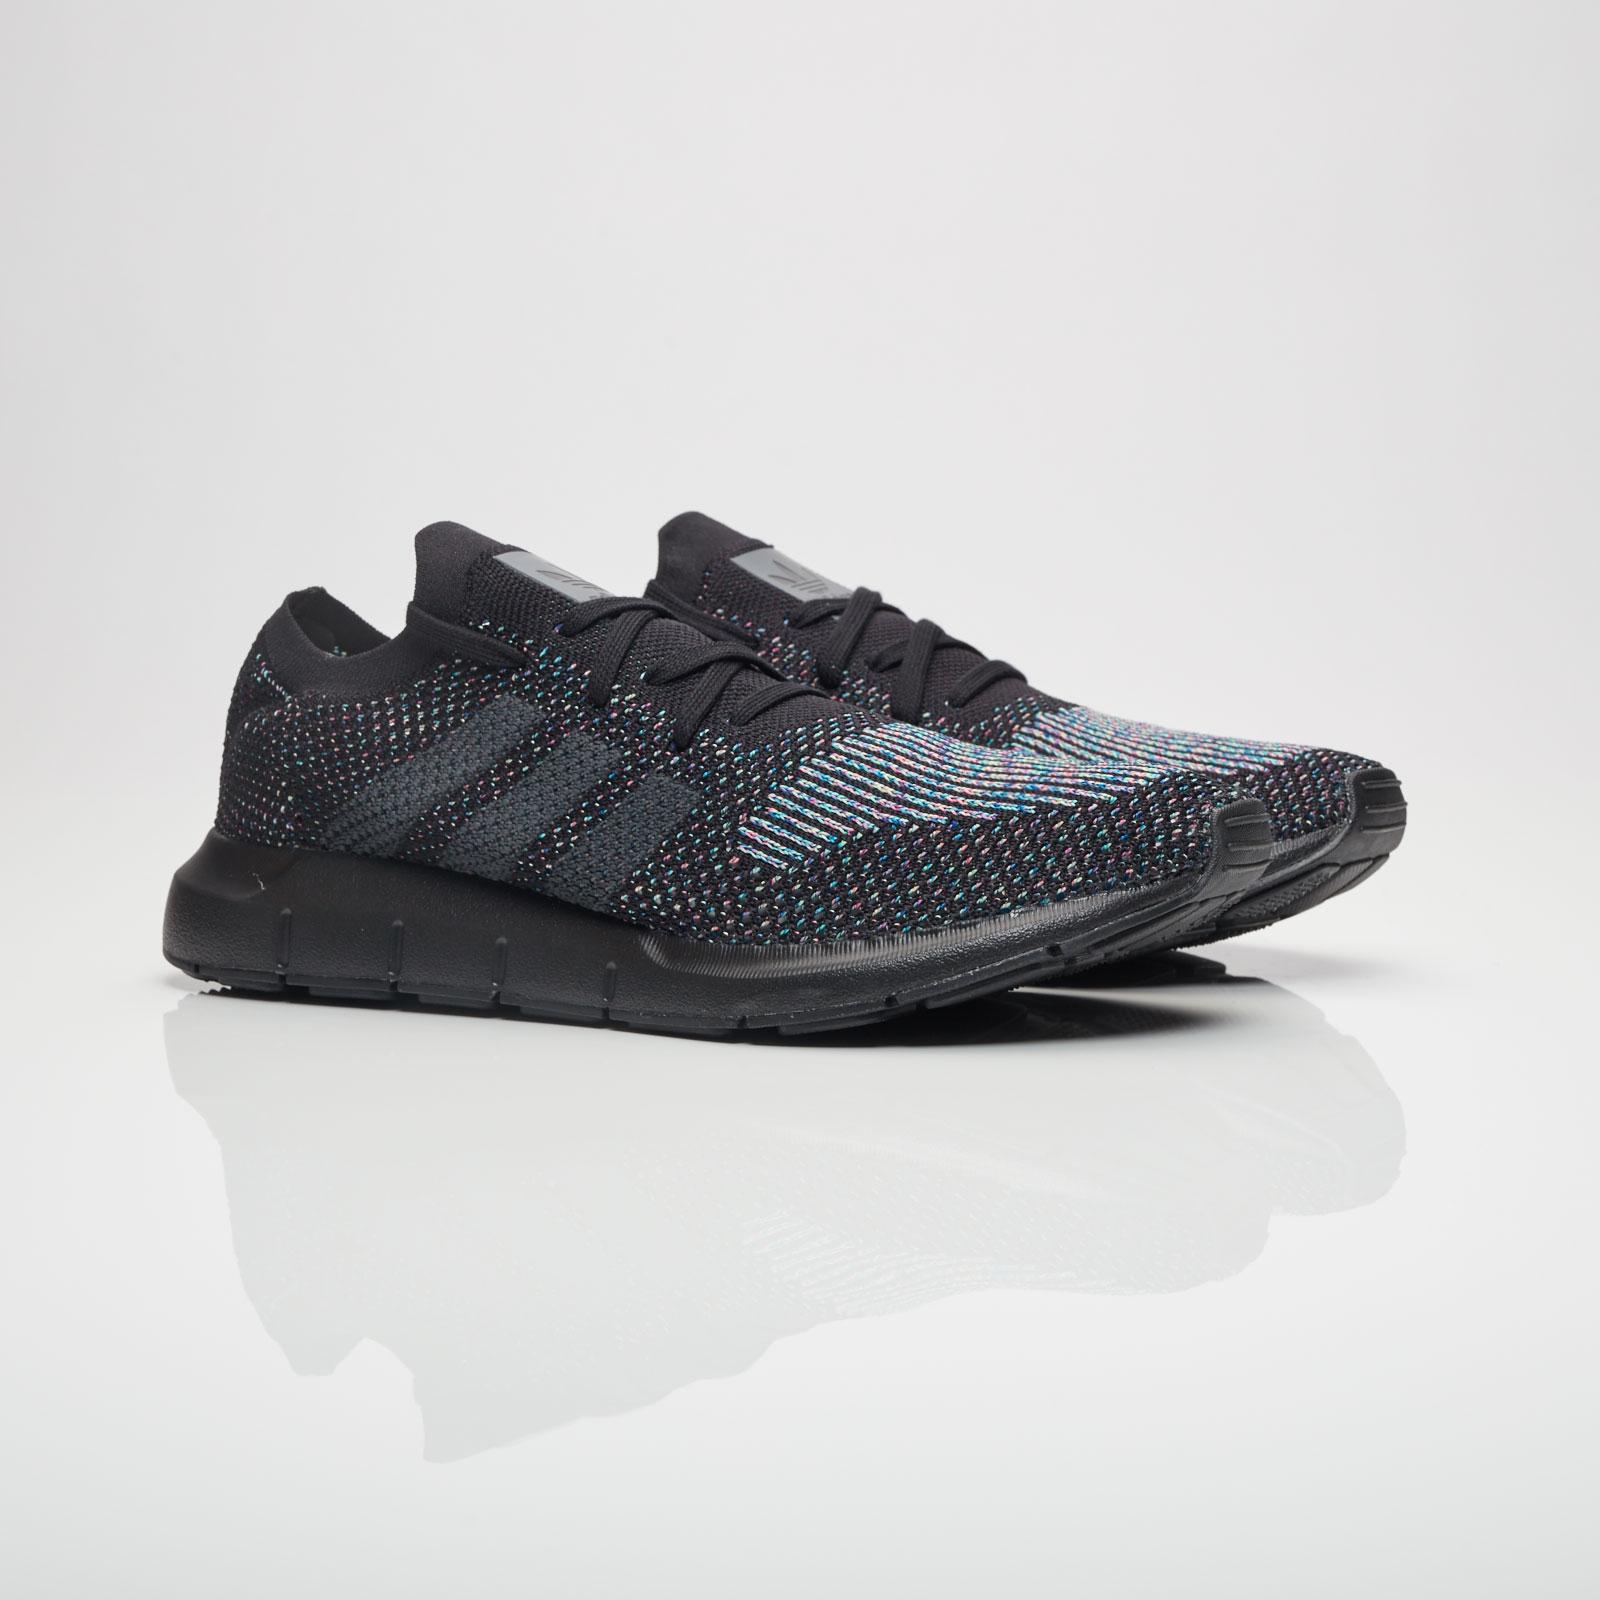 708a55aa0cbb1 adidas Swift Run PK - Cg4127 - Sneakersnstuff